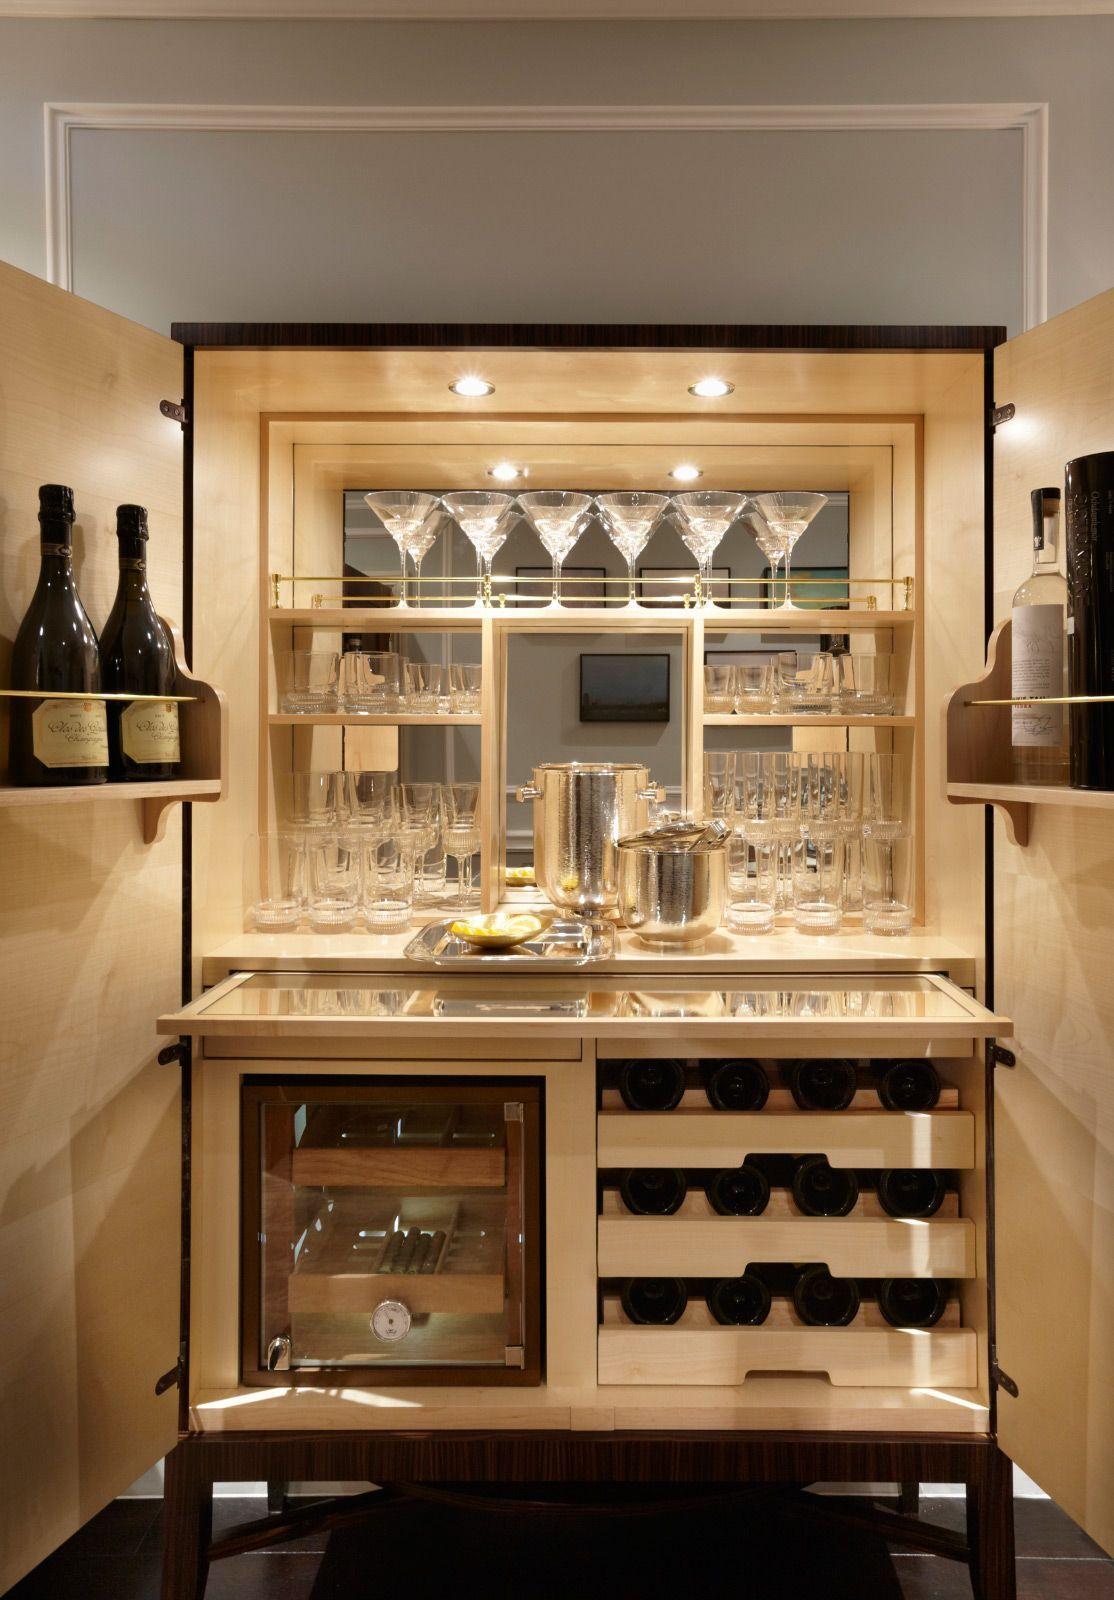 Bar Cabinets For Home In 2020 Hausbar Designs Hausbarschrank Kuche Mit Theke